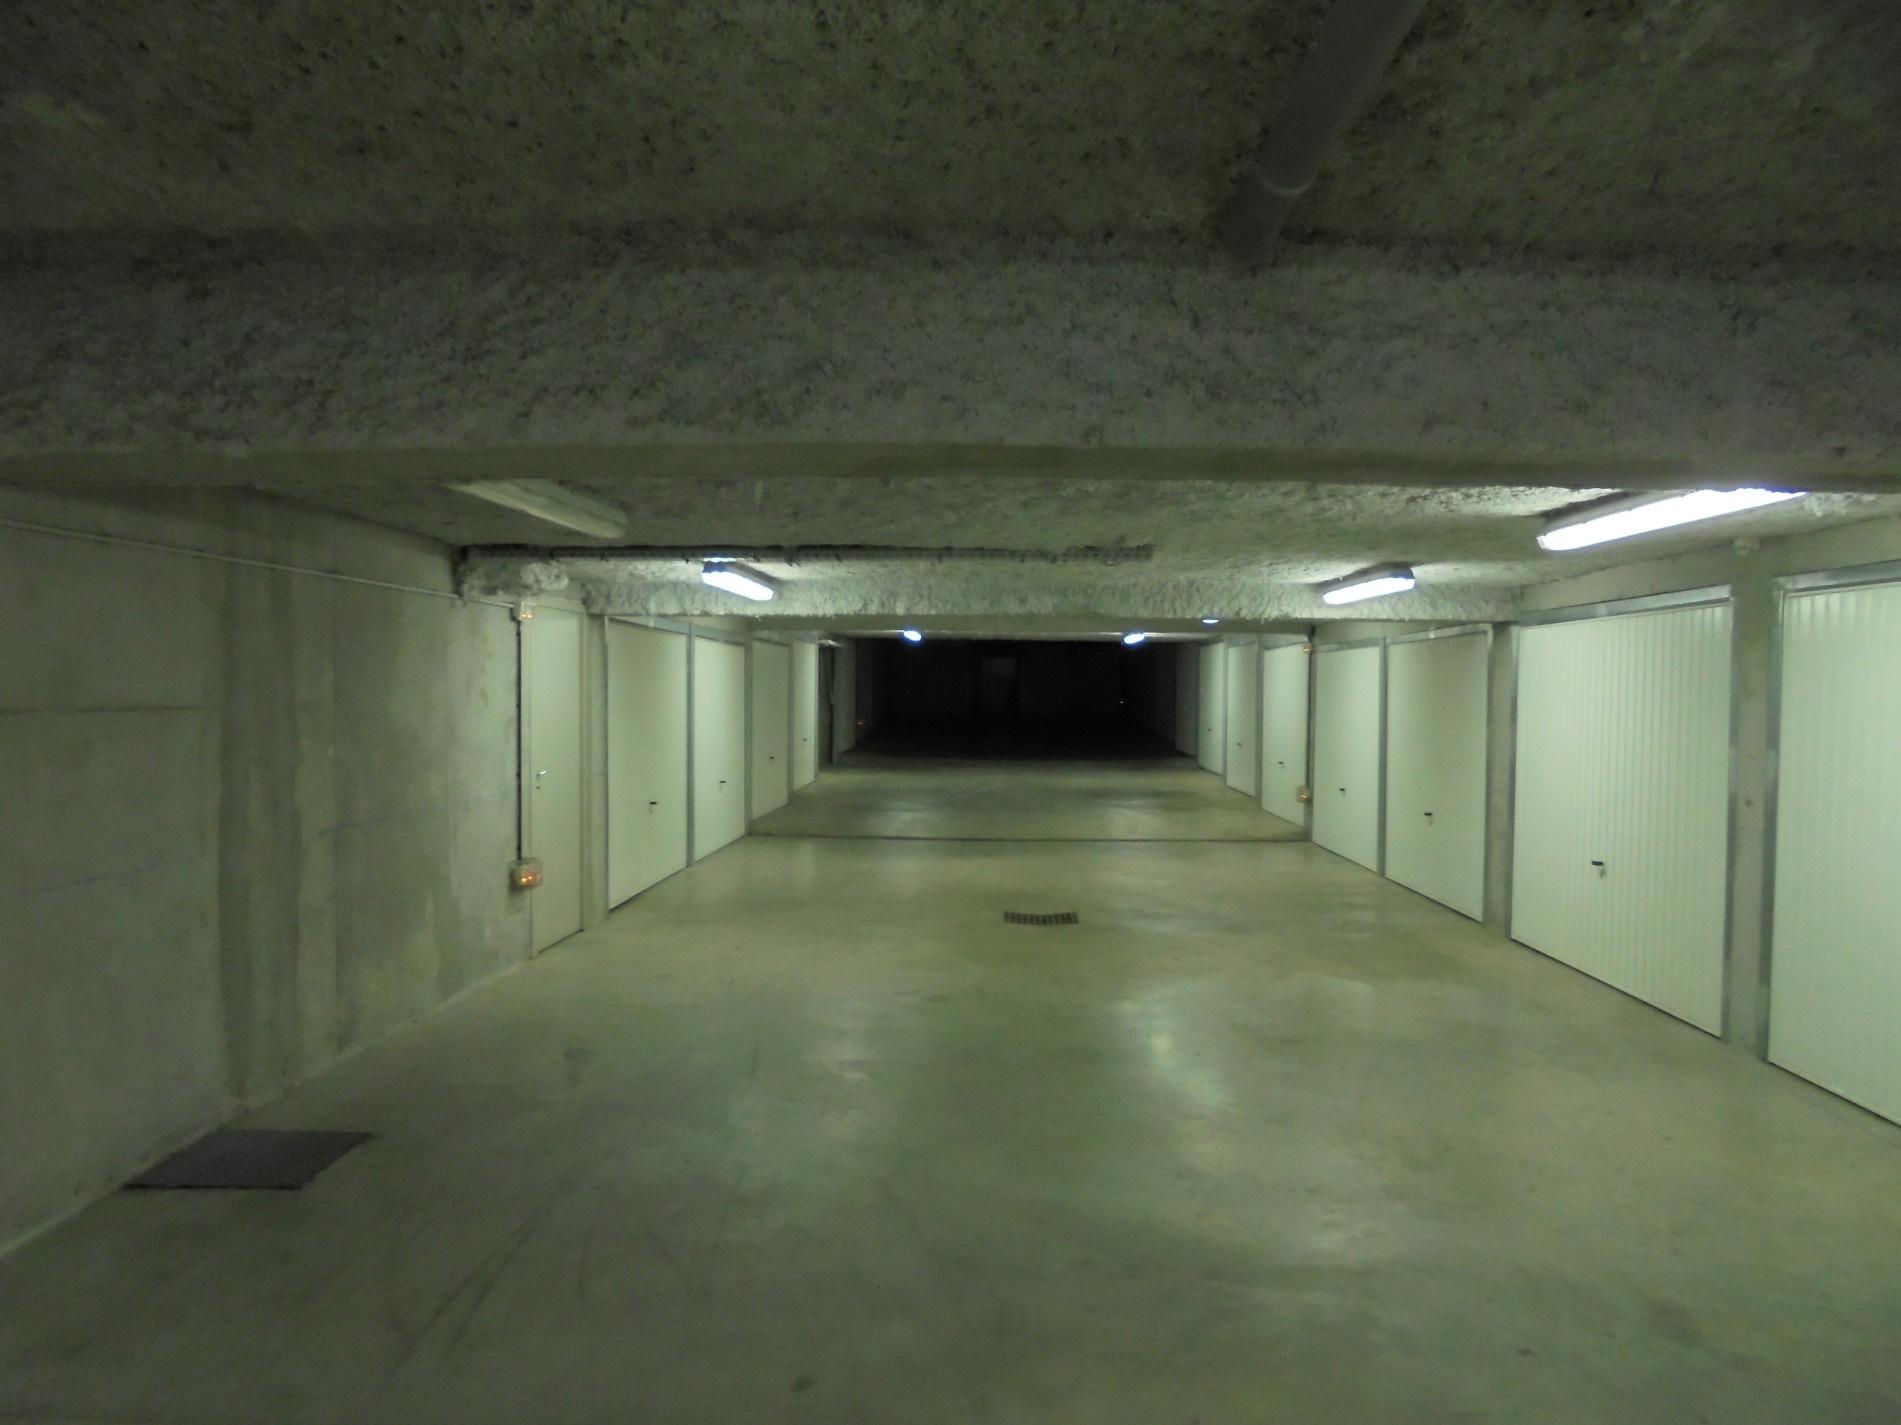 Vente garage andrezieux boutheon for Garage tardy saint etienne